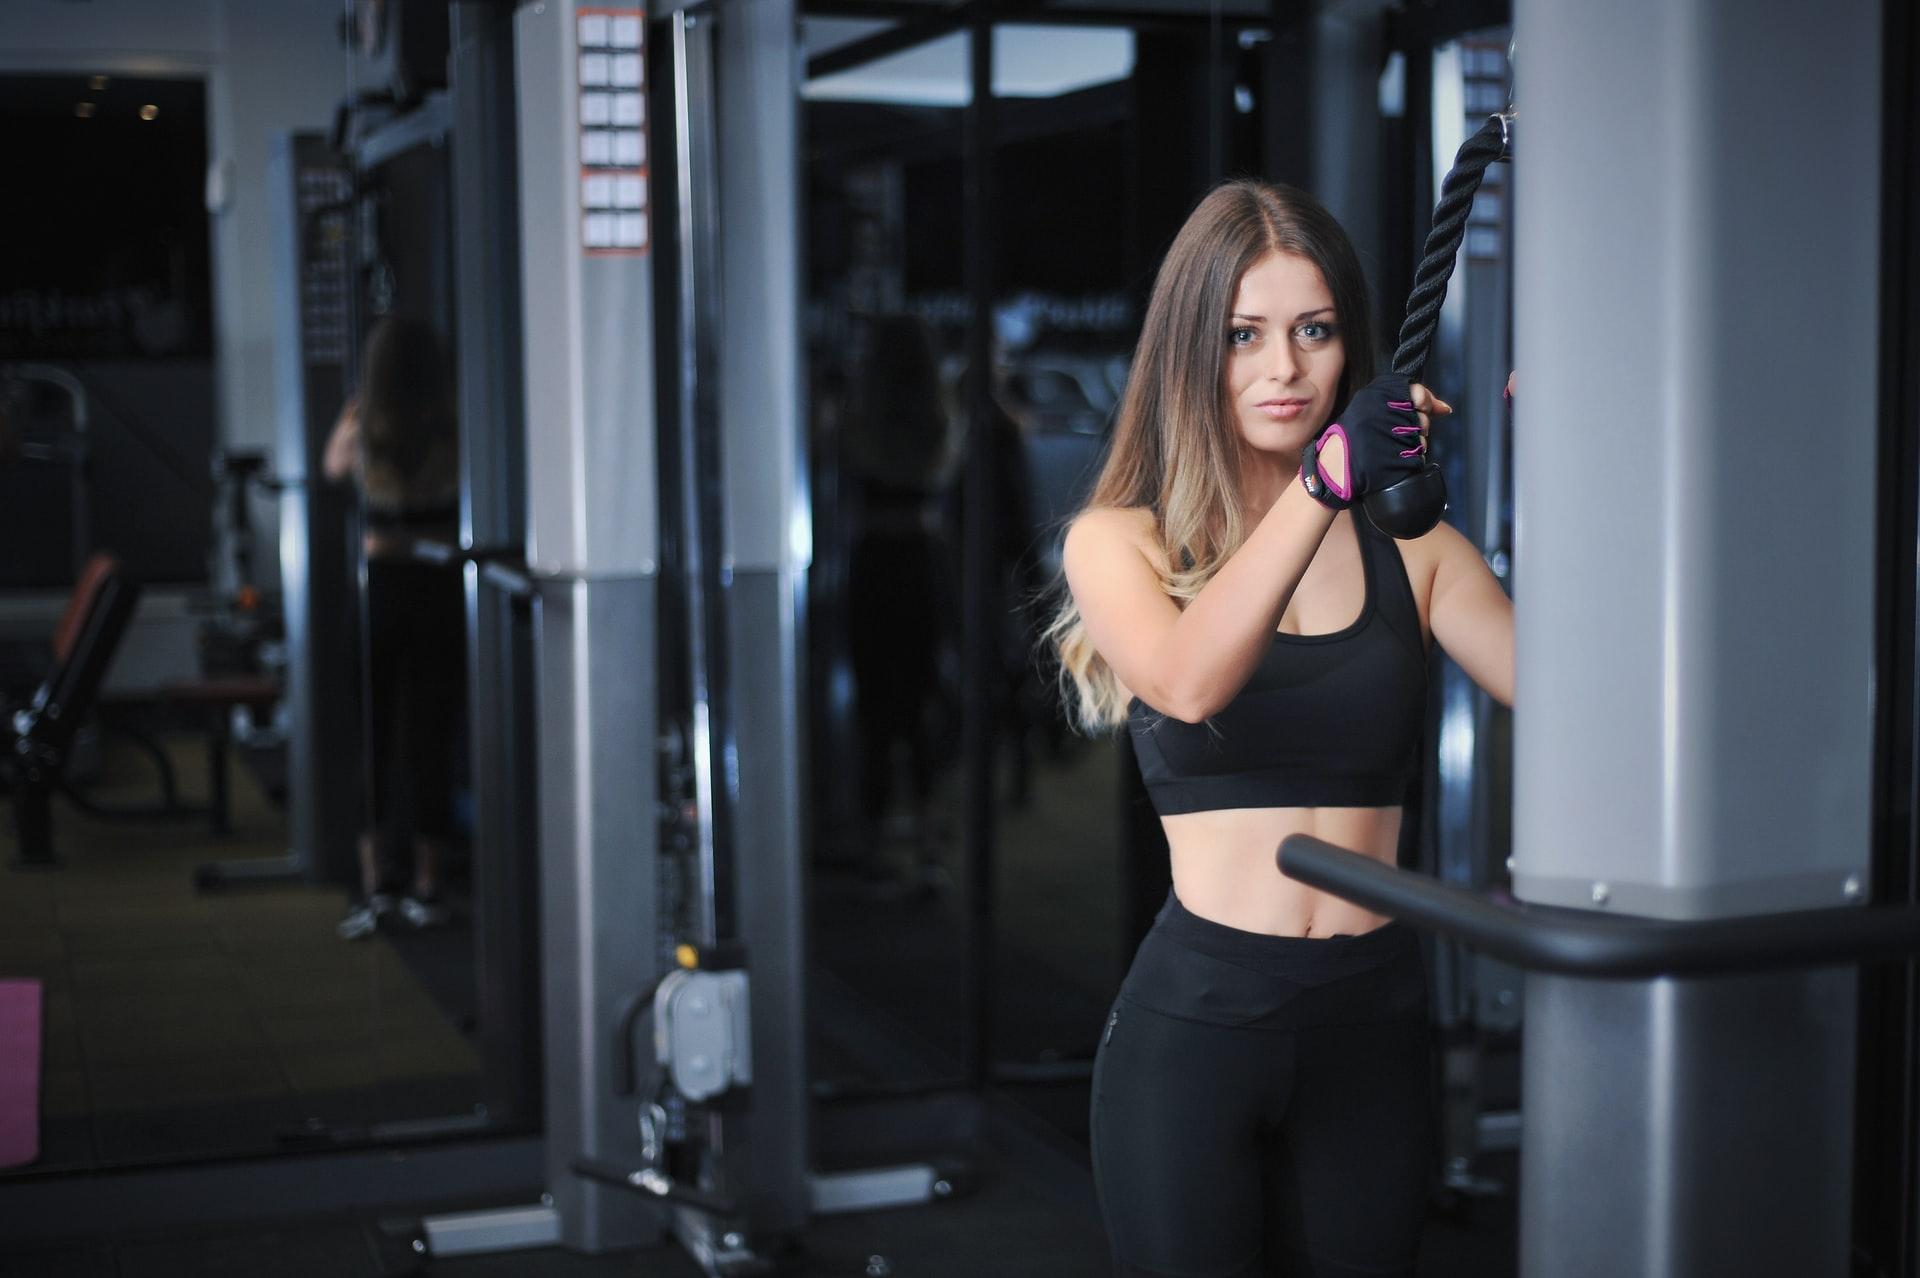 girl in gym